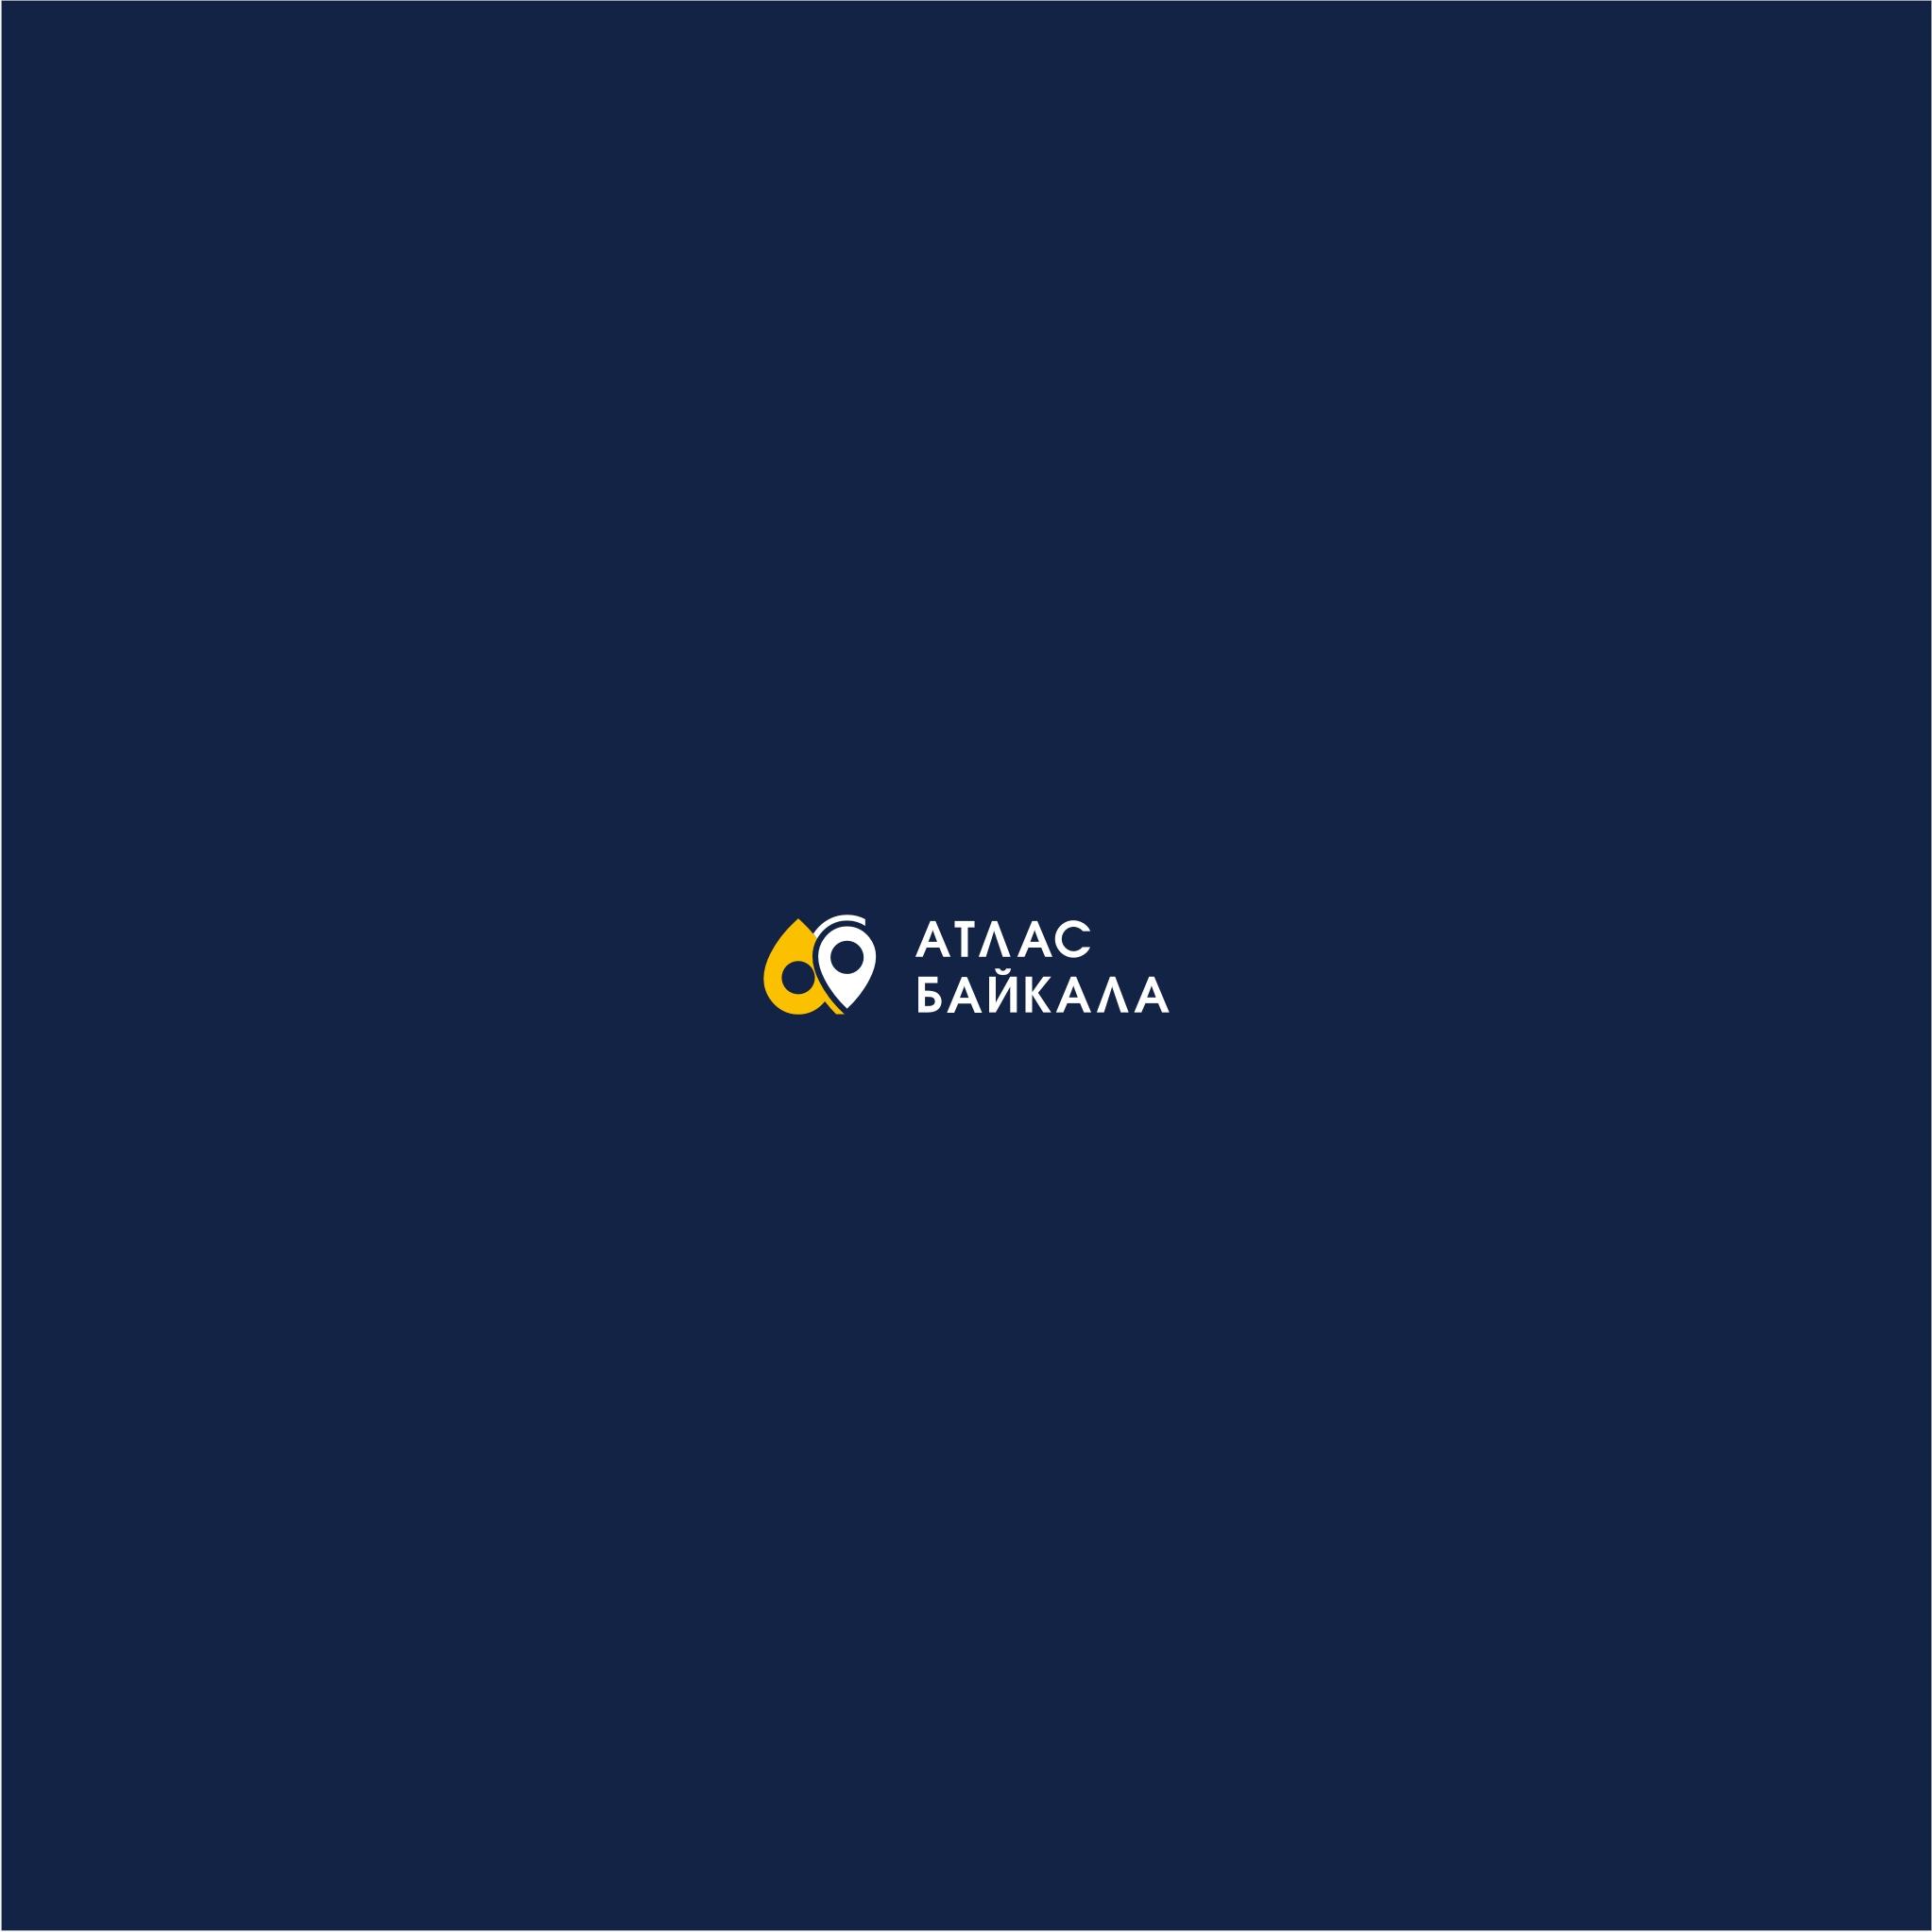 Разработка логотипа Атлас Байкала фото f_3425b152eb6eef97.jpg